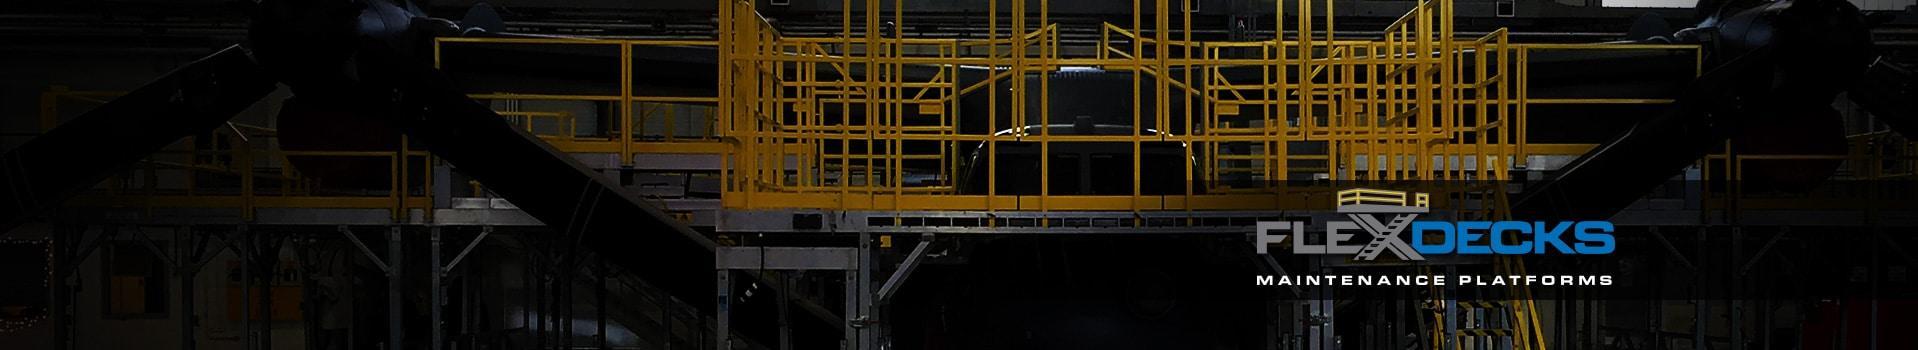 aircraft maintenance platforms